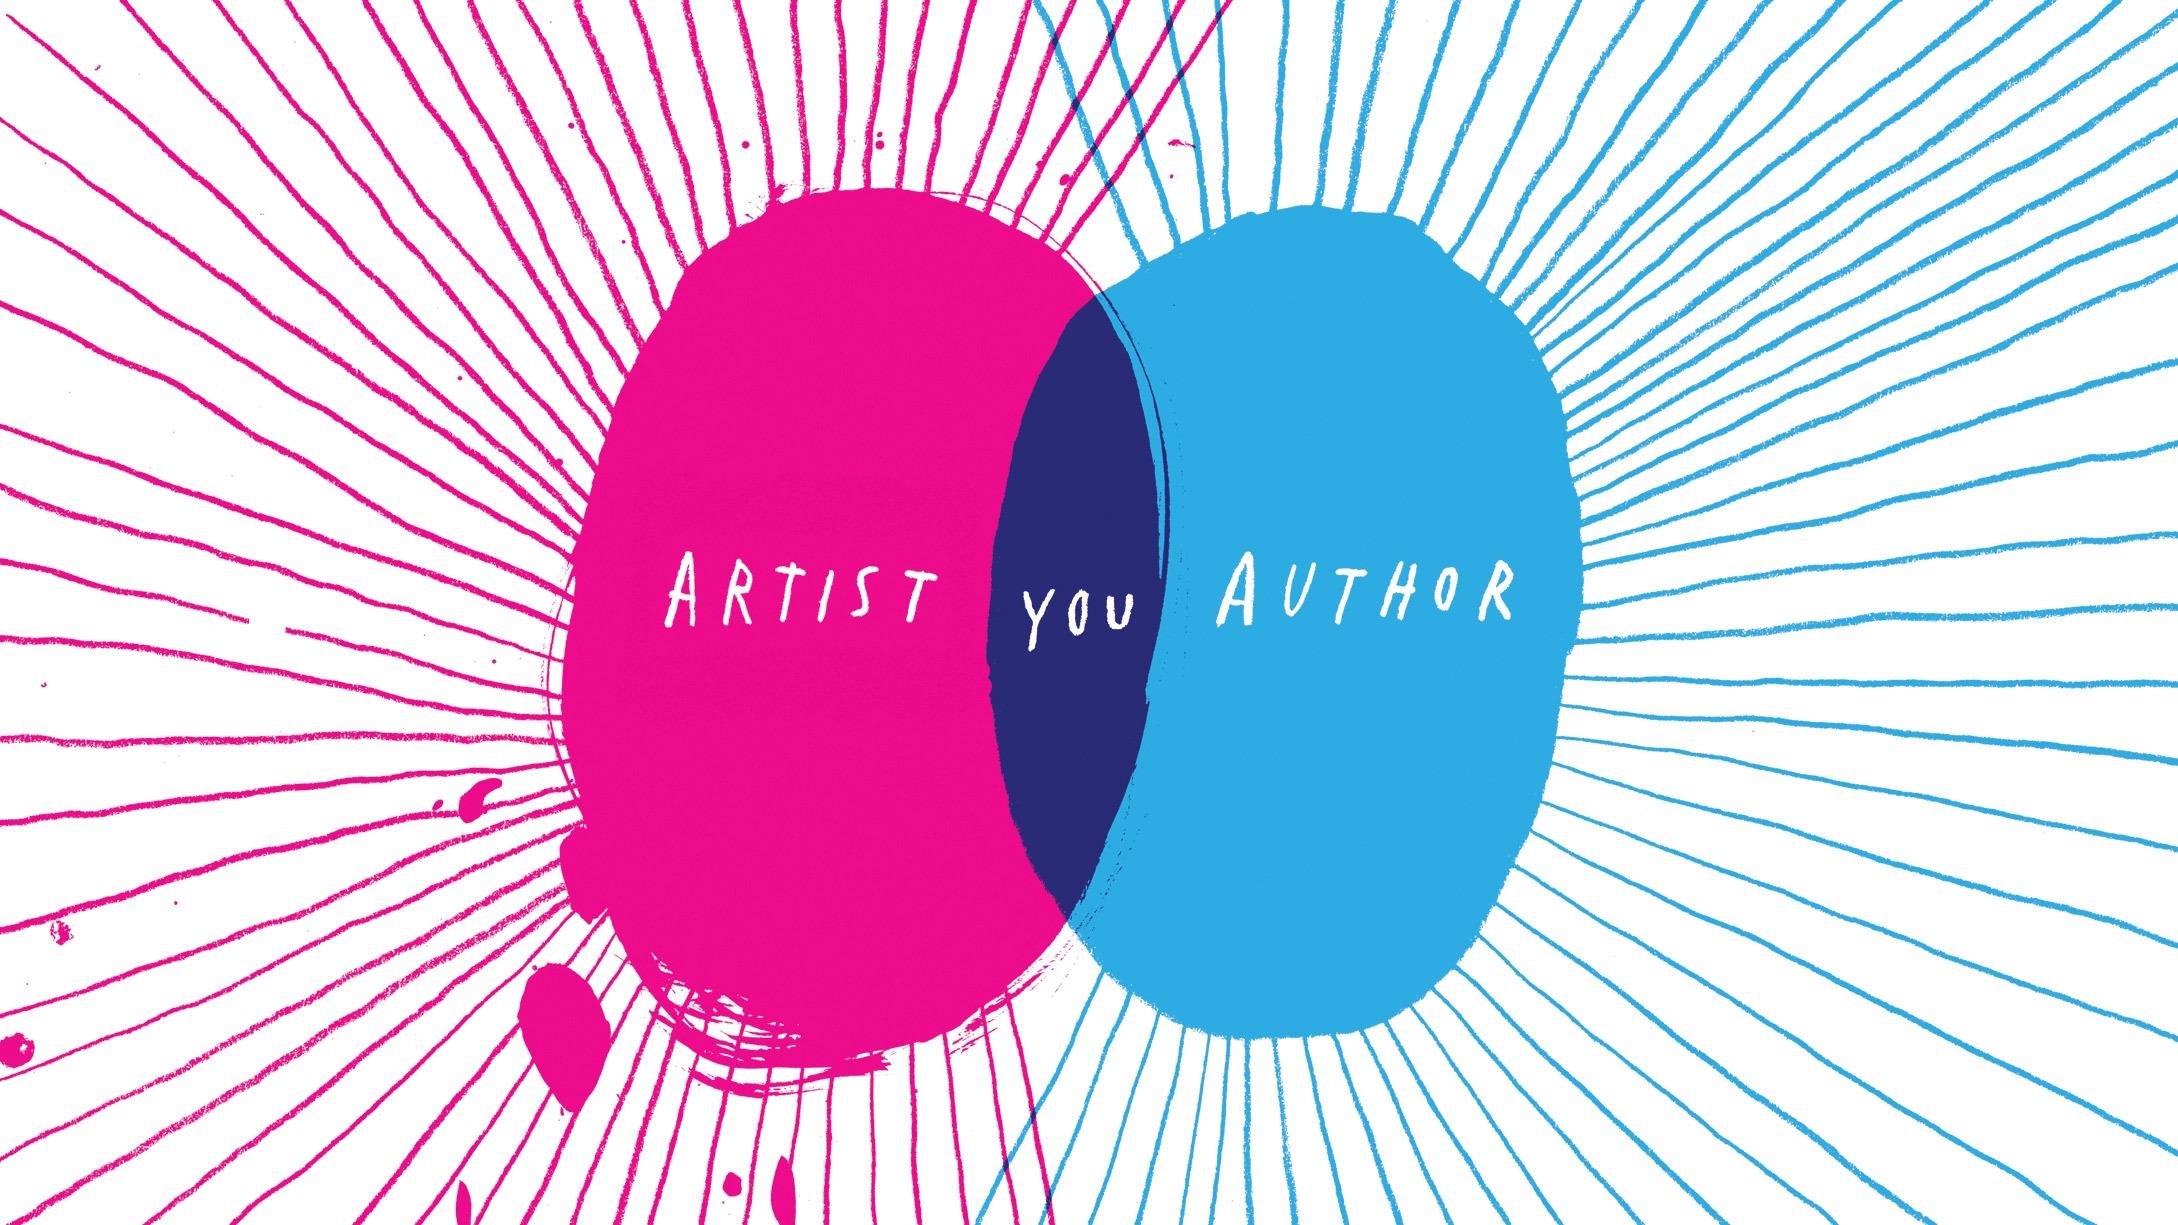 Illustration of Venn diagram: Artist, You, Author